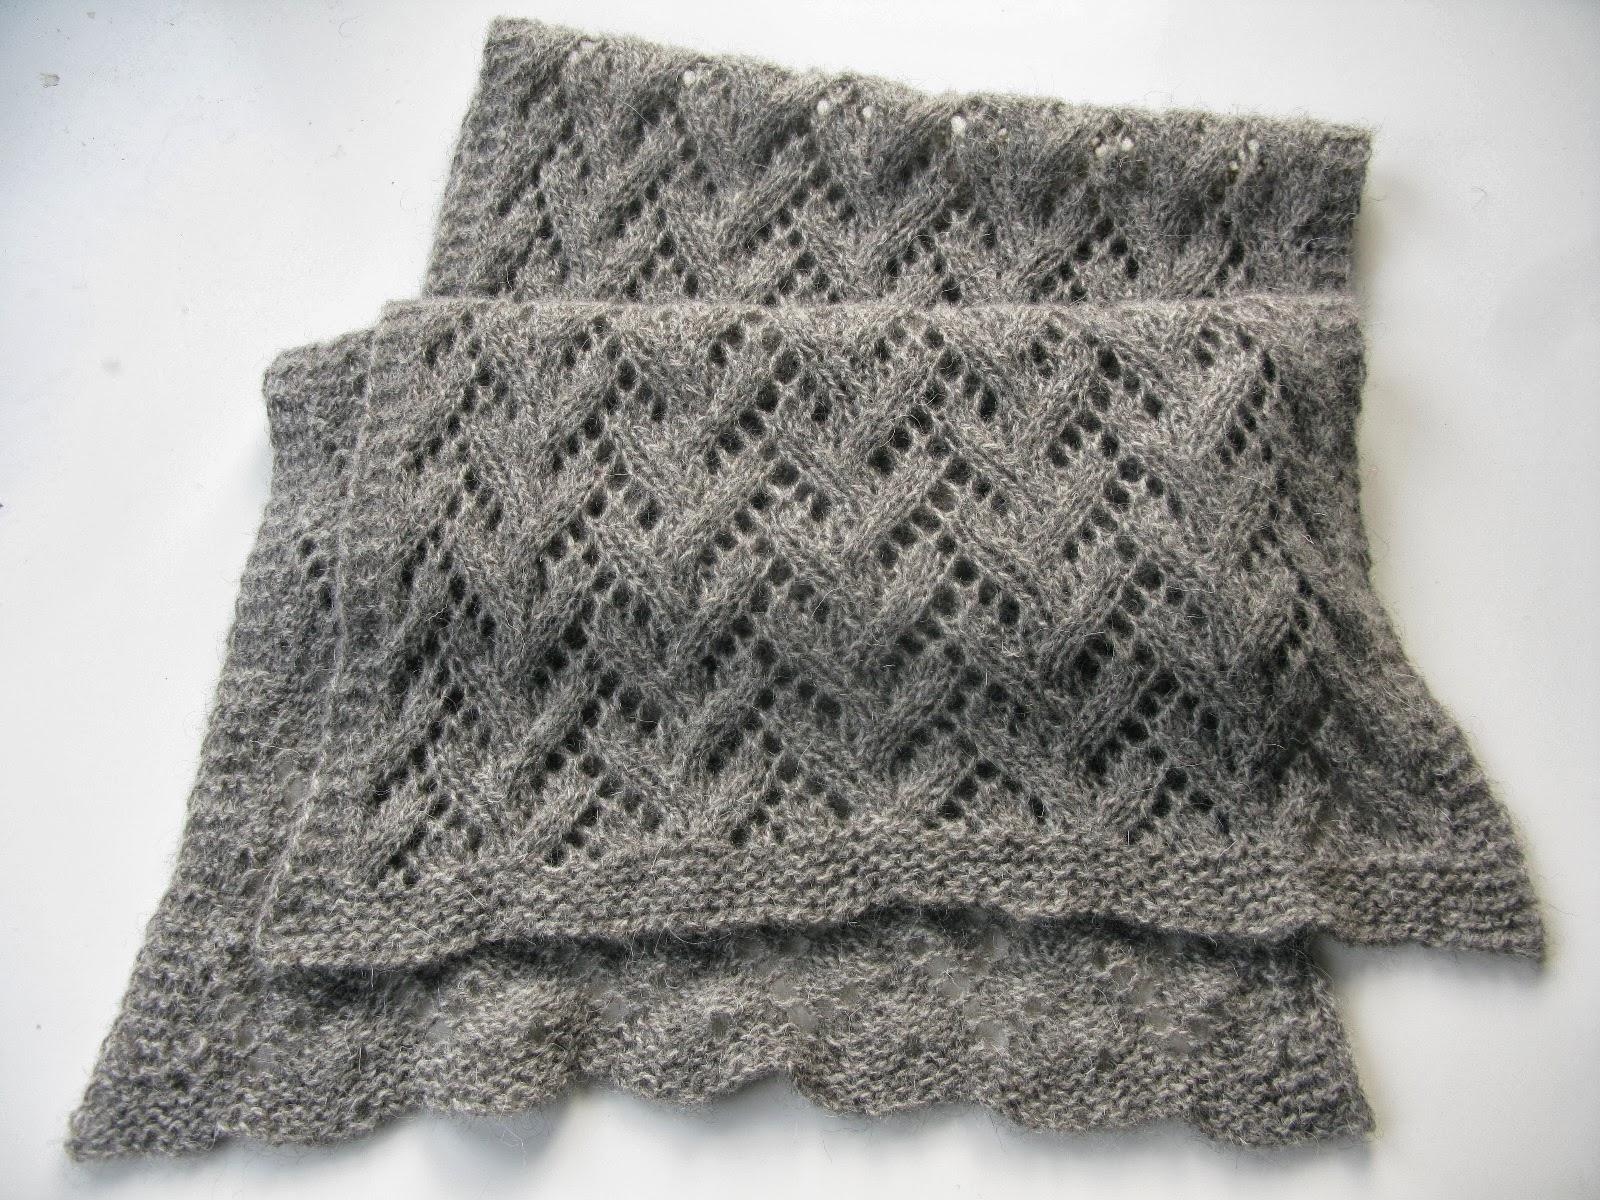 littletheorem: Felted Lace Wrap Pattern